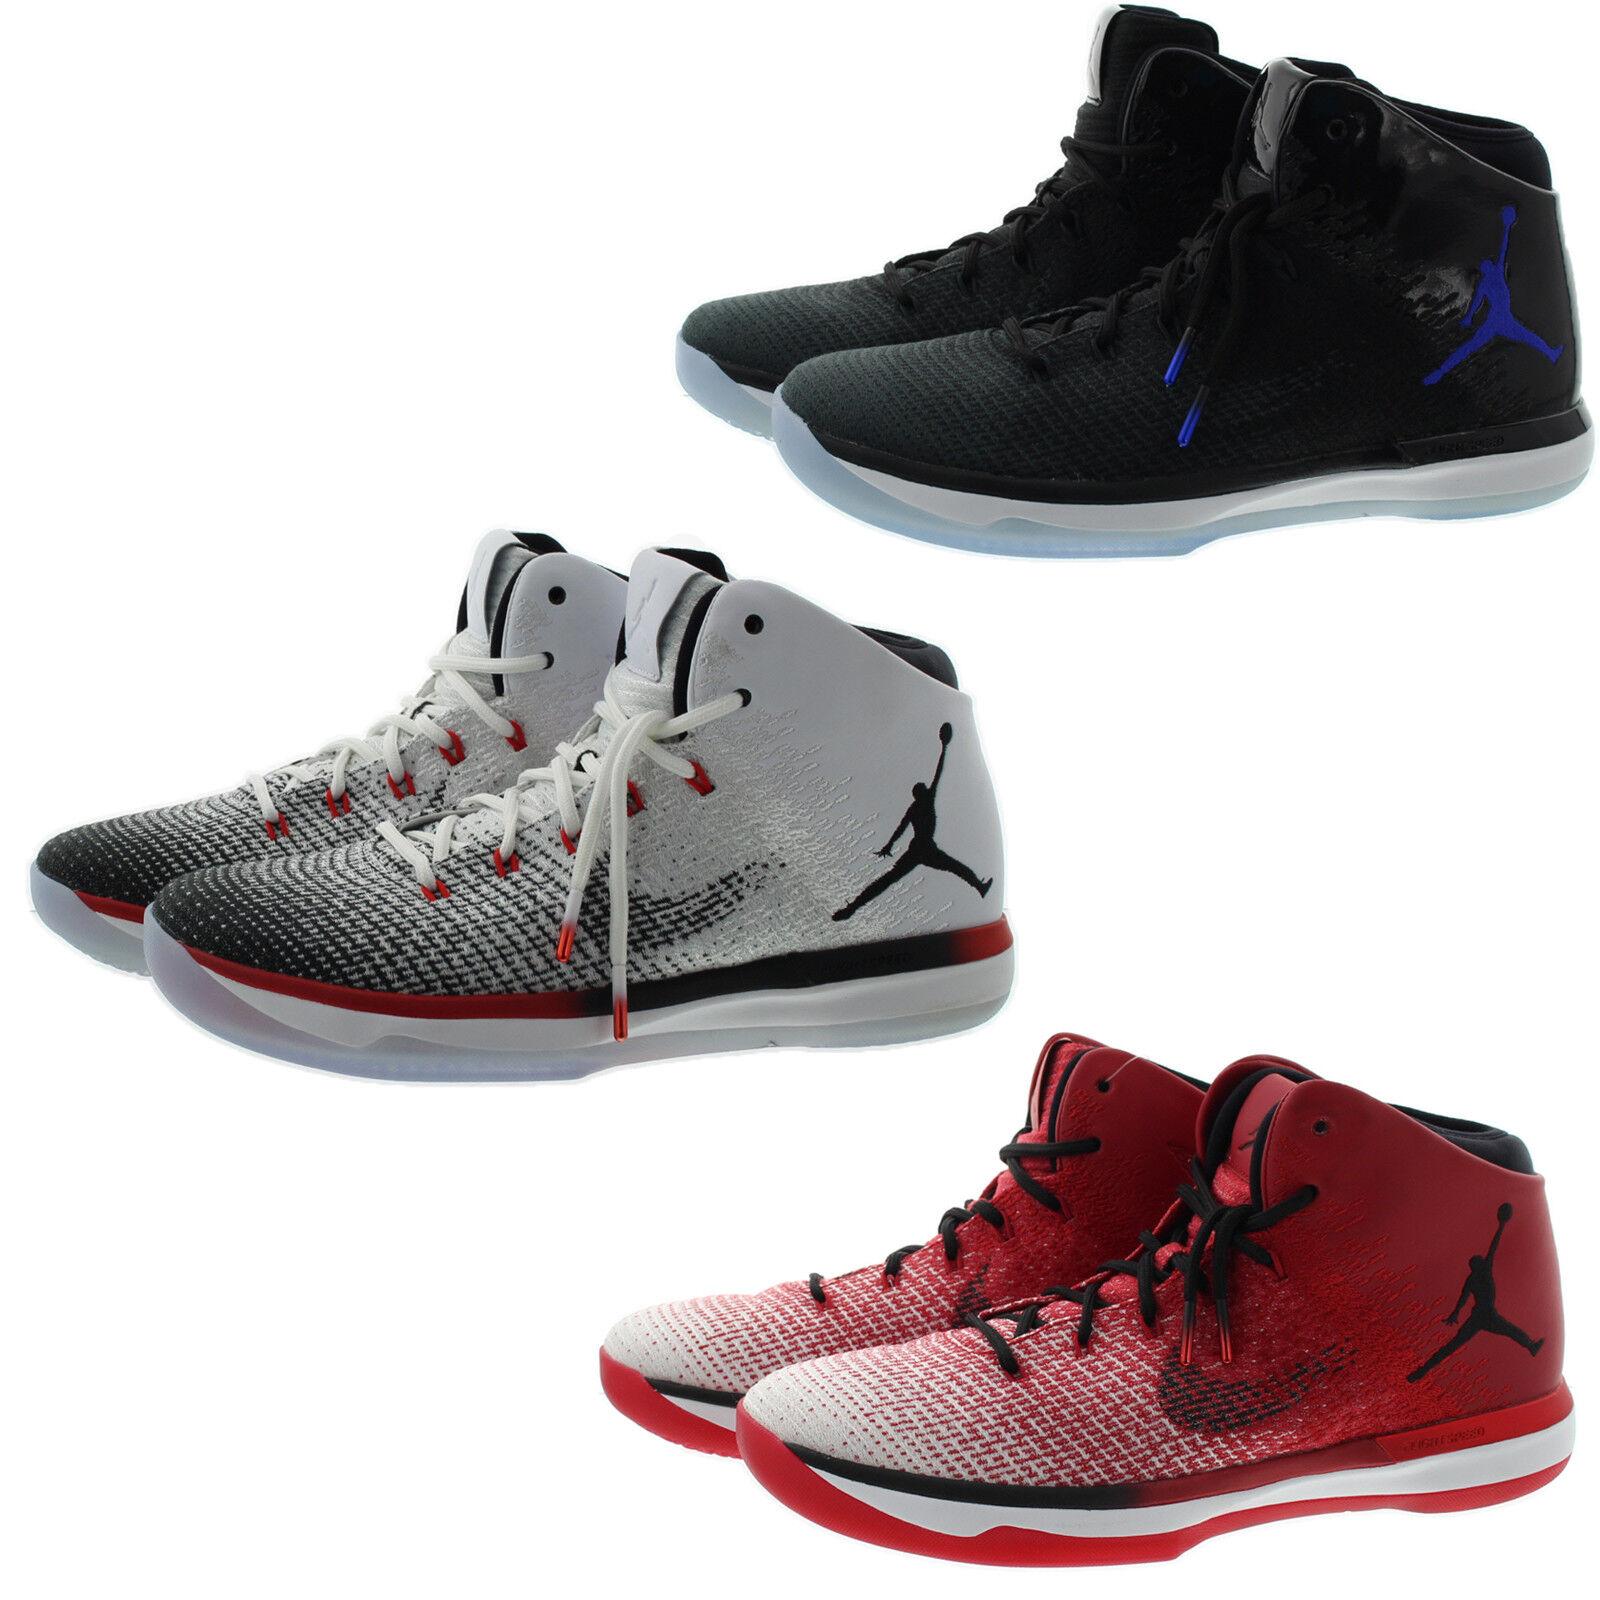 Nike 845037 Mens Air Jordan XXXI High Top Basketball shoes Sneakers